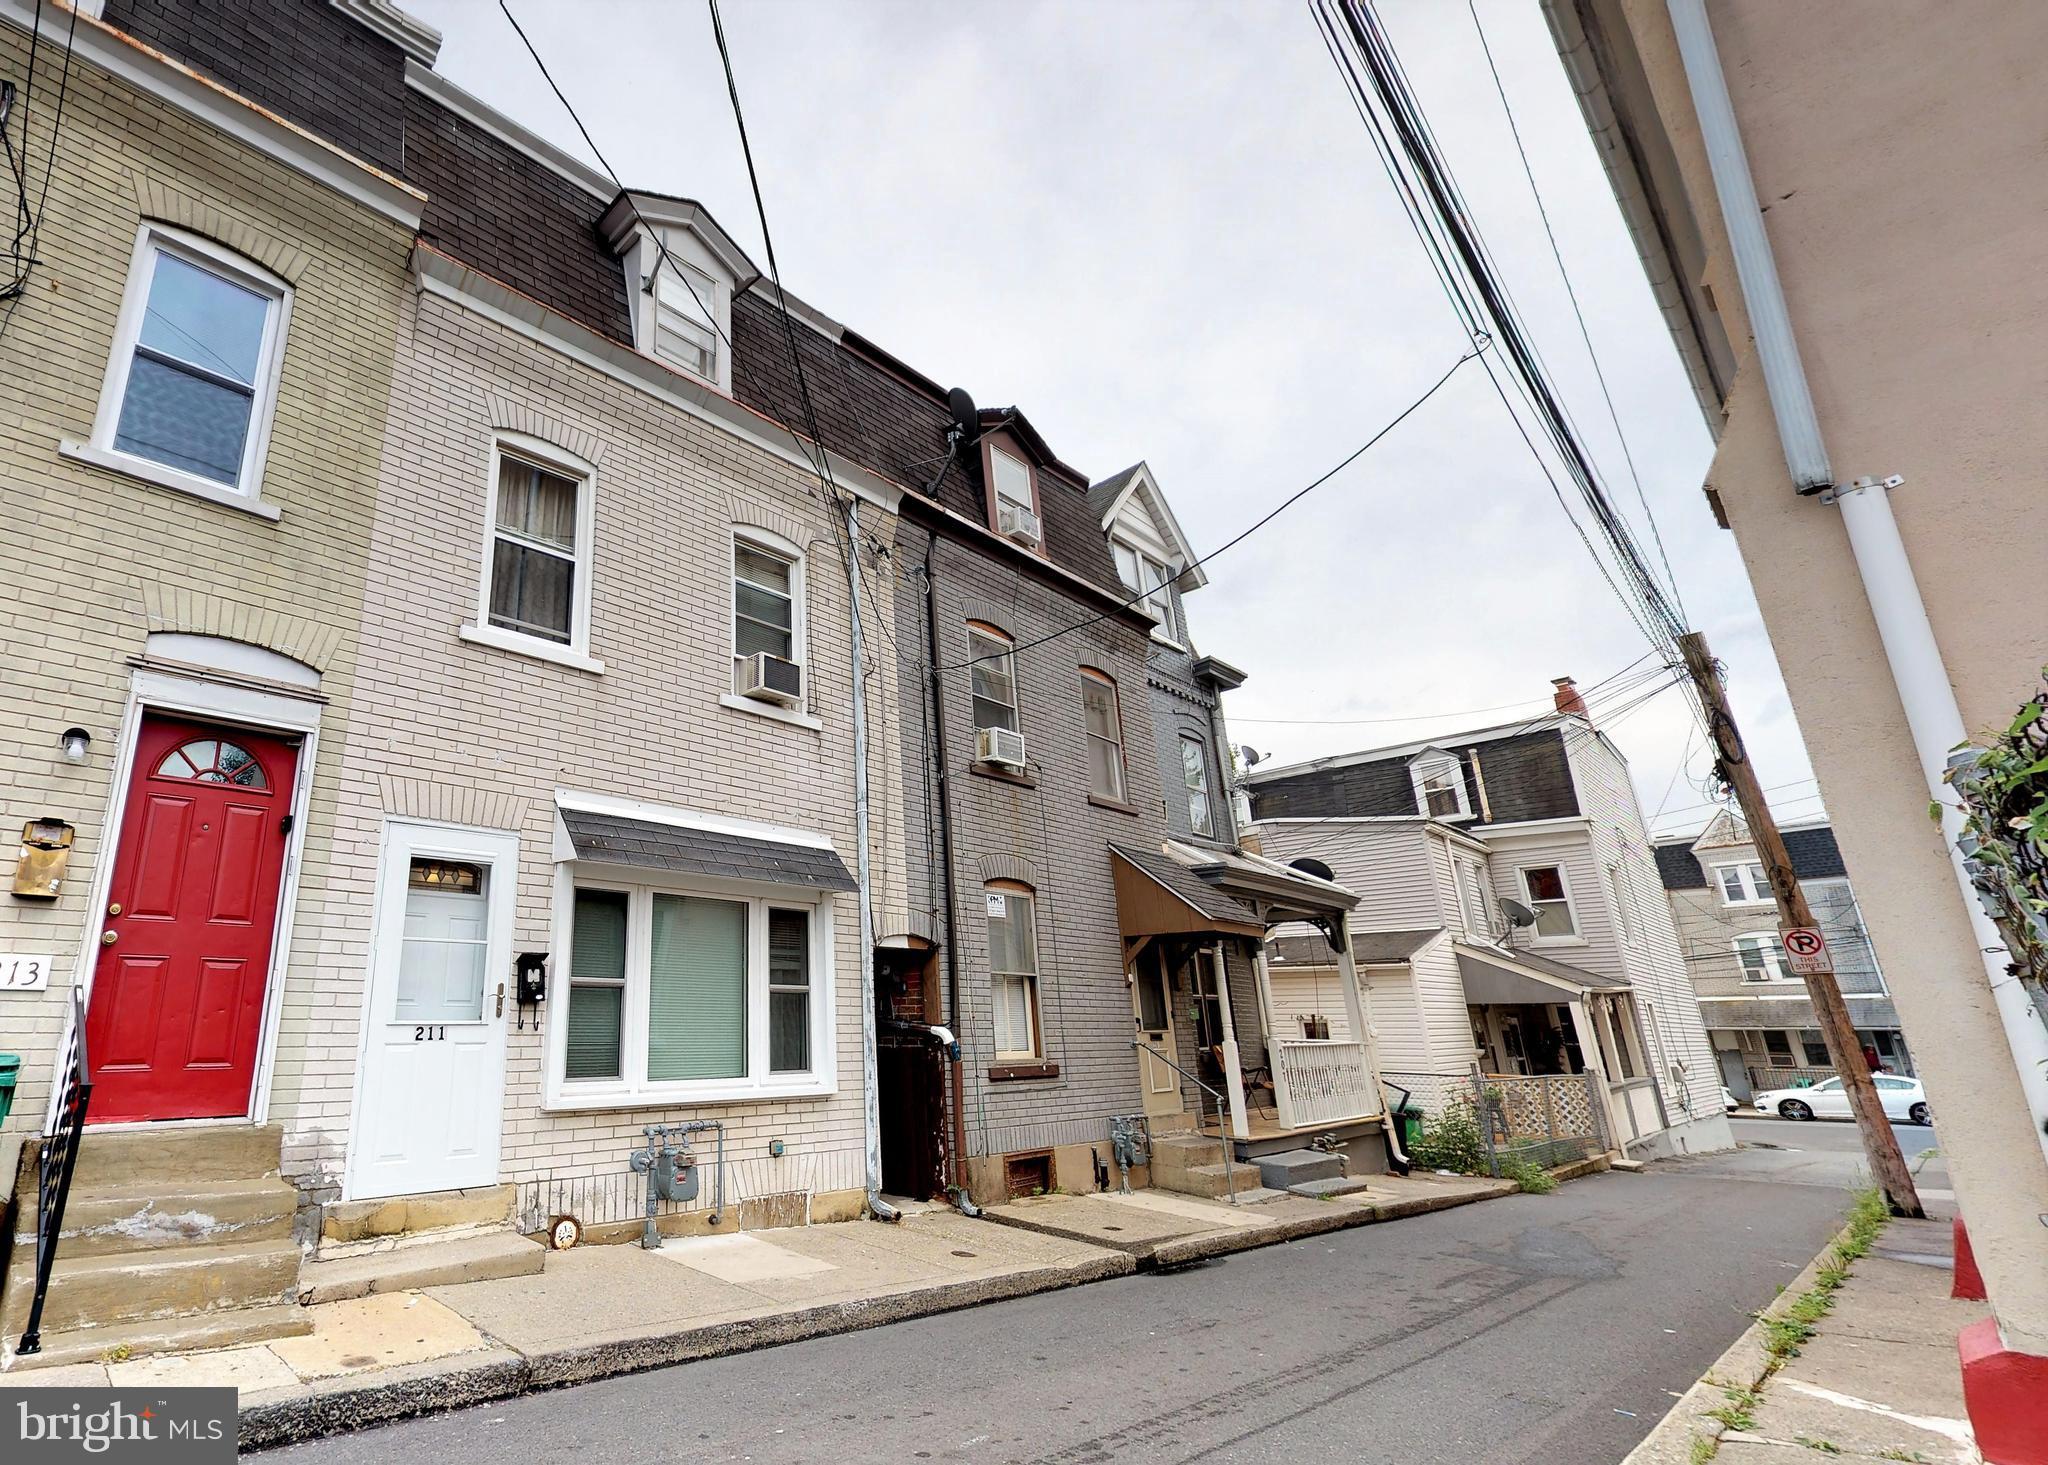 211 GRANT STREET, ALLENTOWN, PA 18102